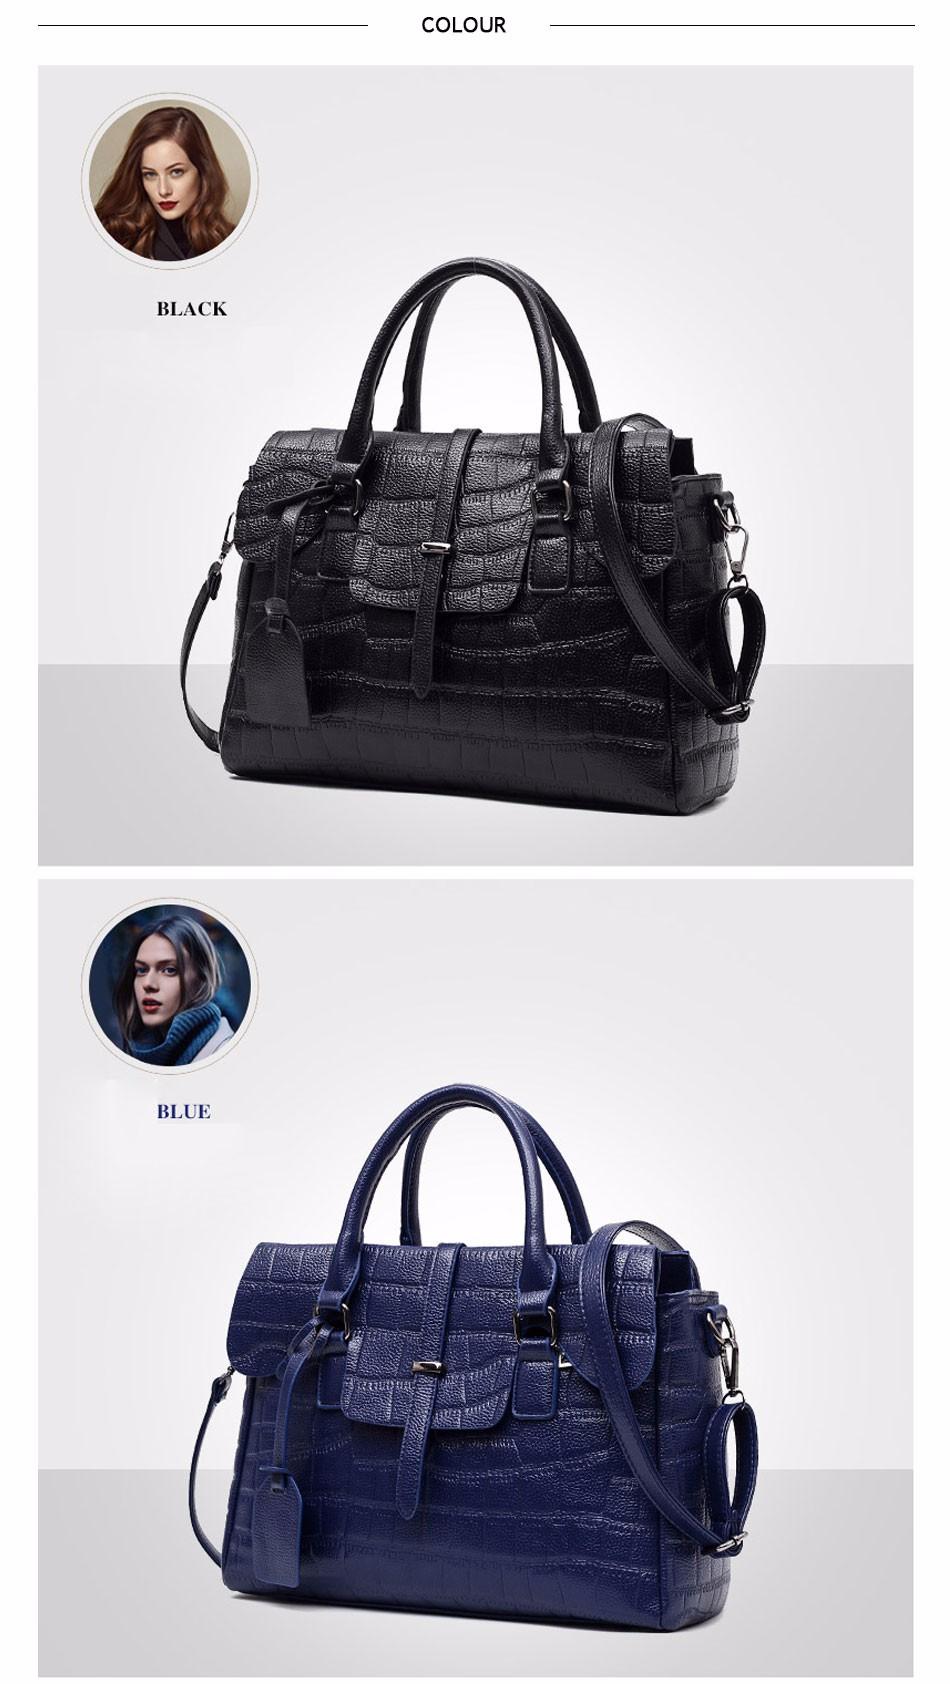 High Quality PU Leather Women's Handbags Shoulder Bag Ladies Hand Bags Stone Casual Women Bag Large Capacity Handbag 17 Sac 7